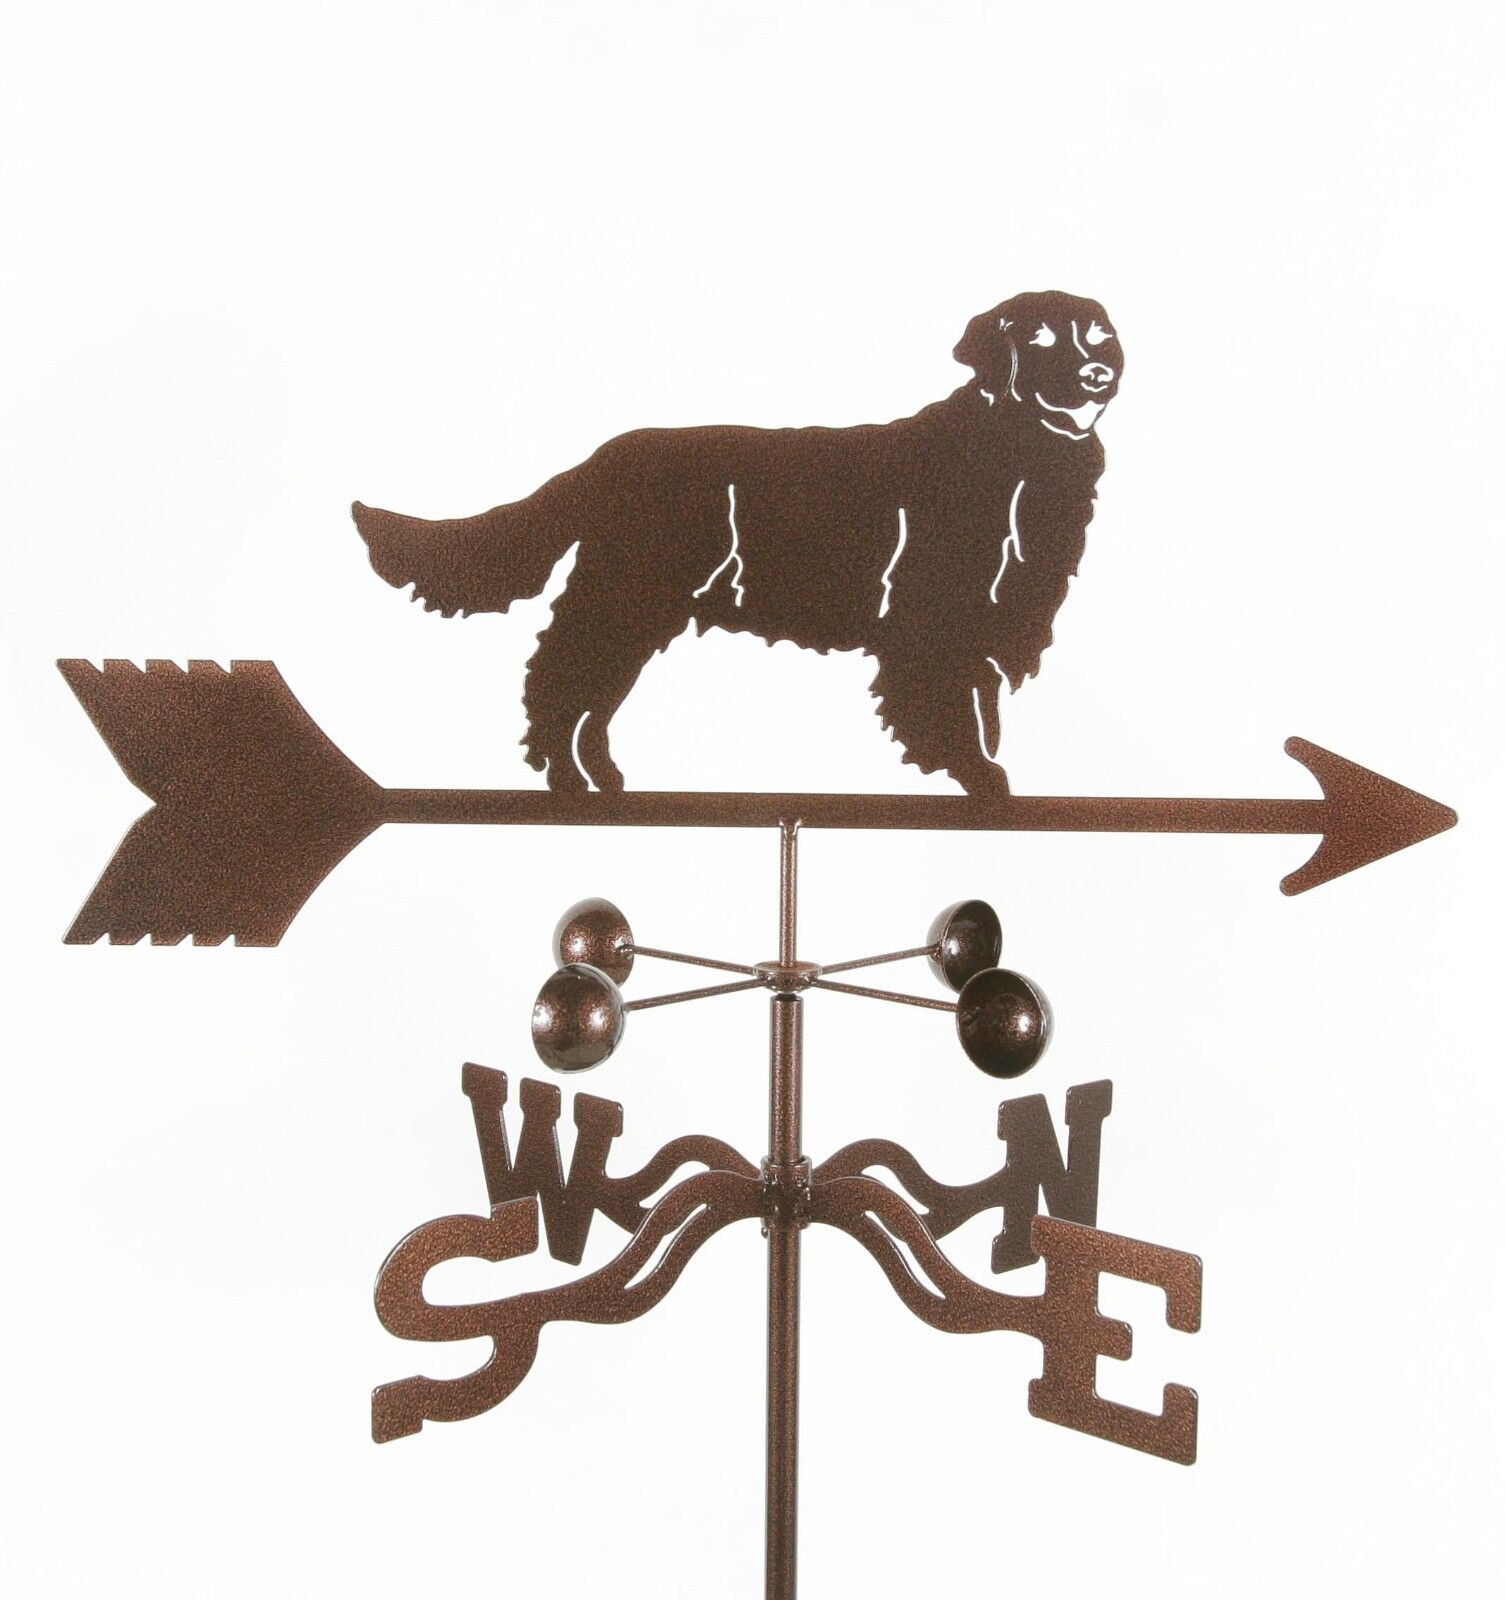 Dog - Golden Retriever Weathervane - Weather Vane -Complete w/ Choice of Mount